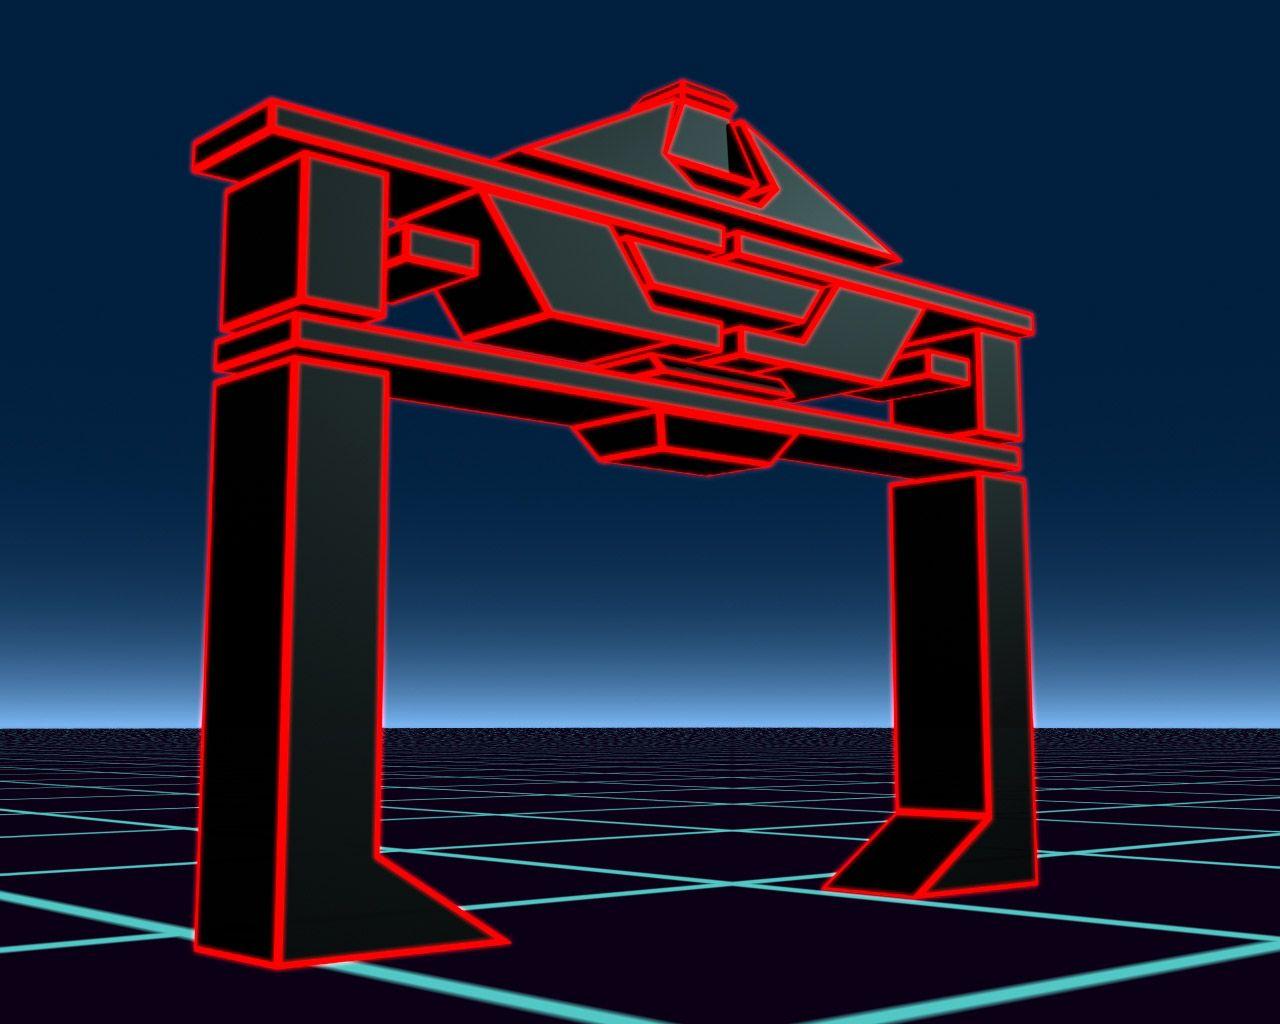 TRON Recognizer | Tron, Tron legacy, Tron art